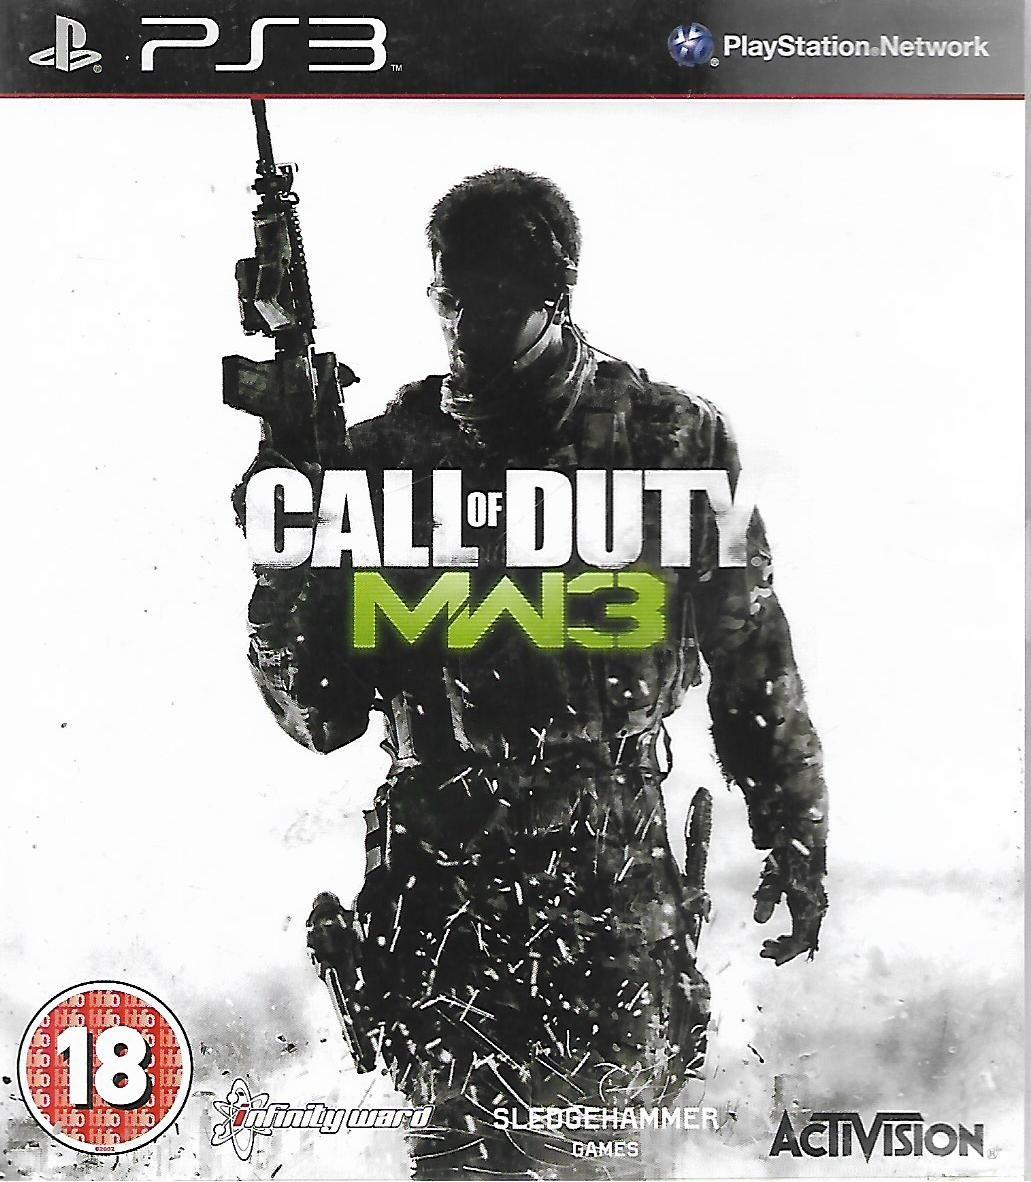 CALL OF DUTY - MODERN WARFARE 3 (PS3 - bazar)